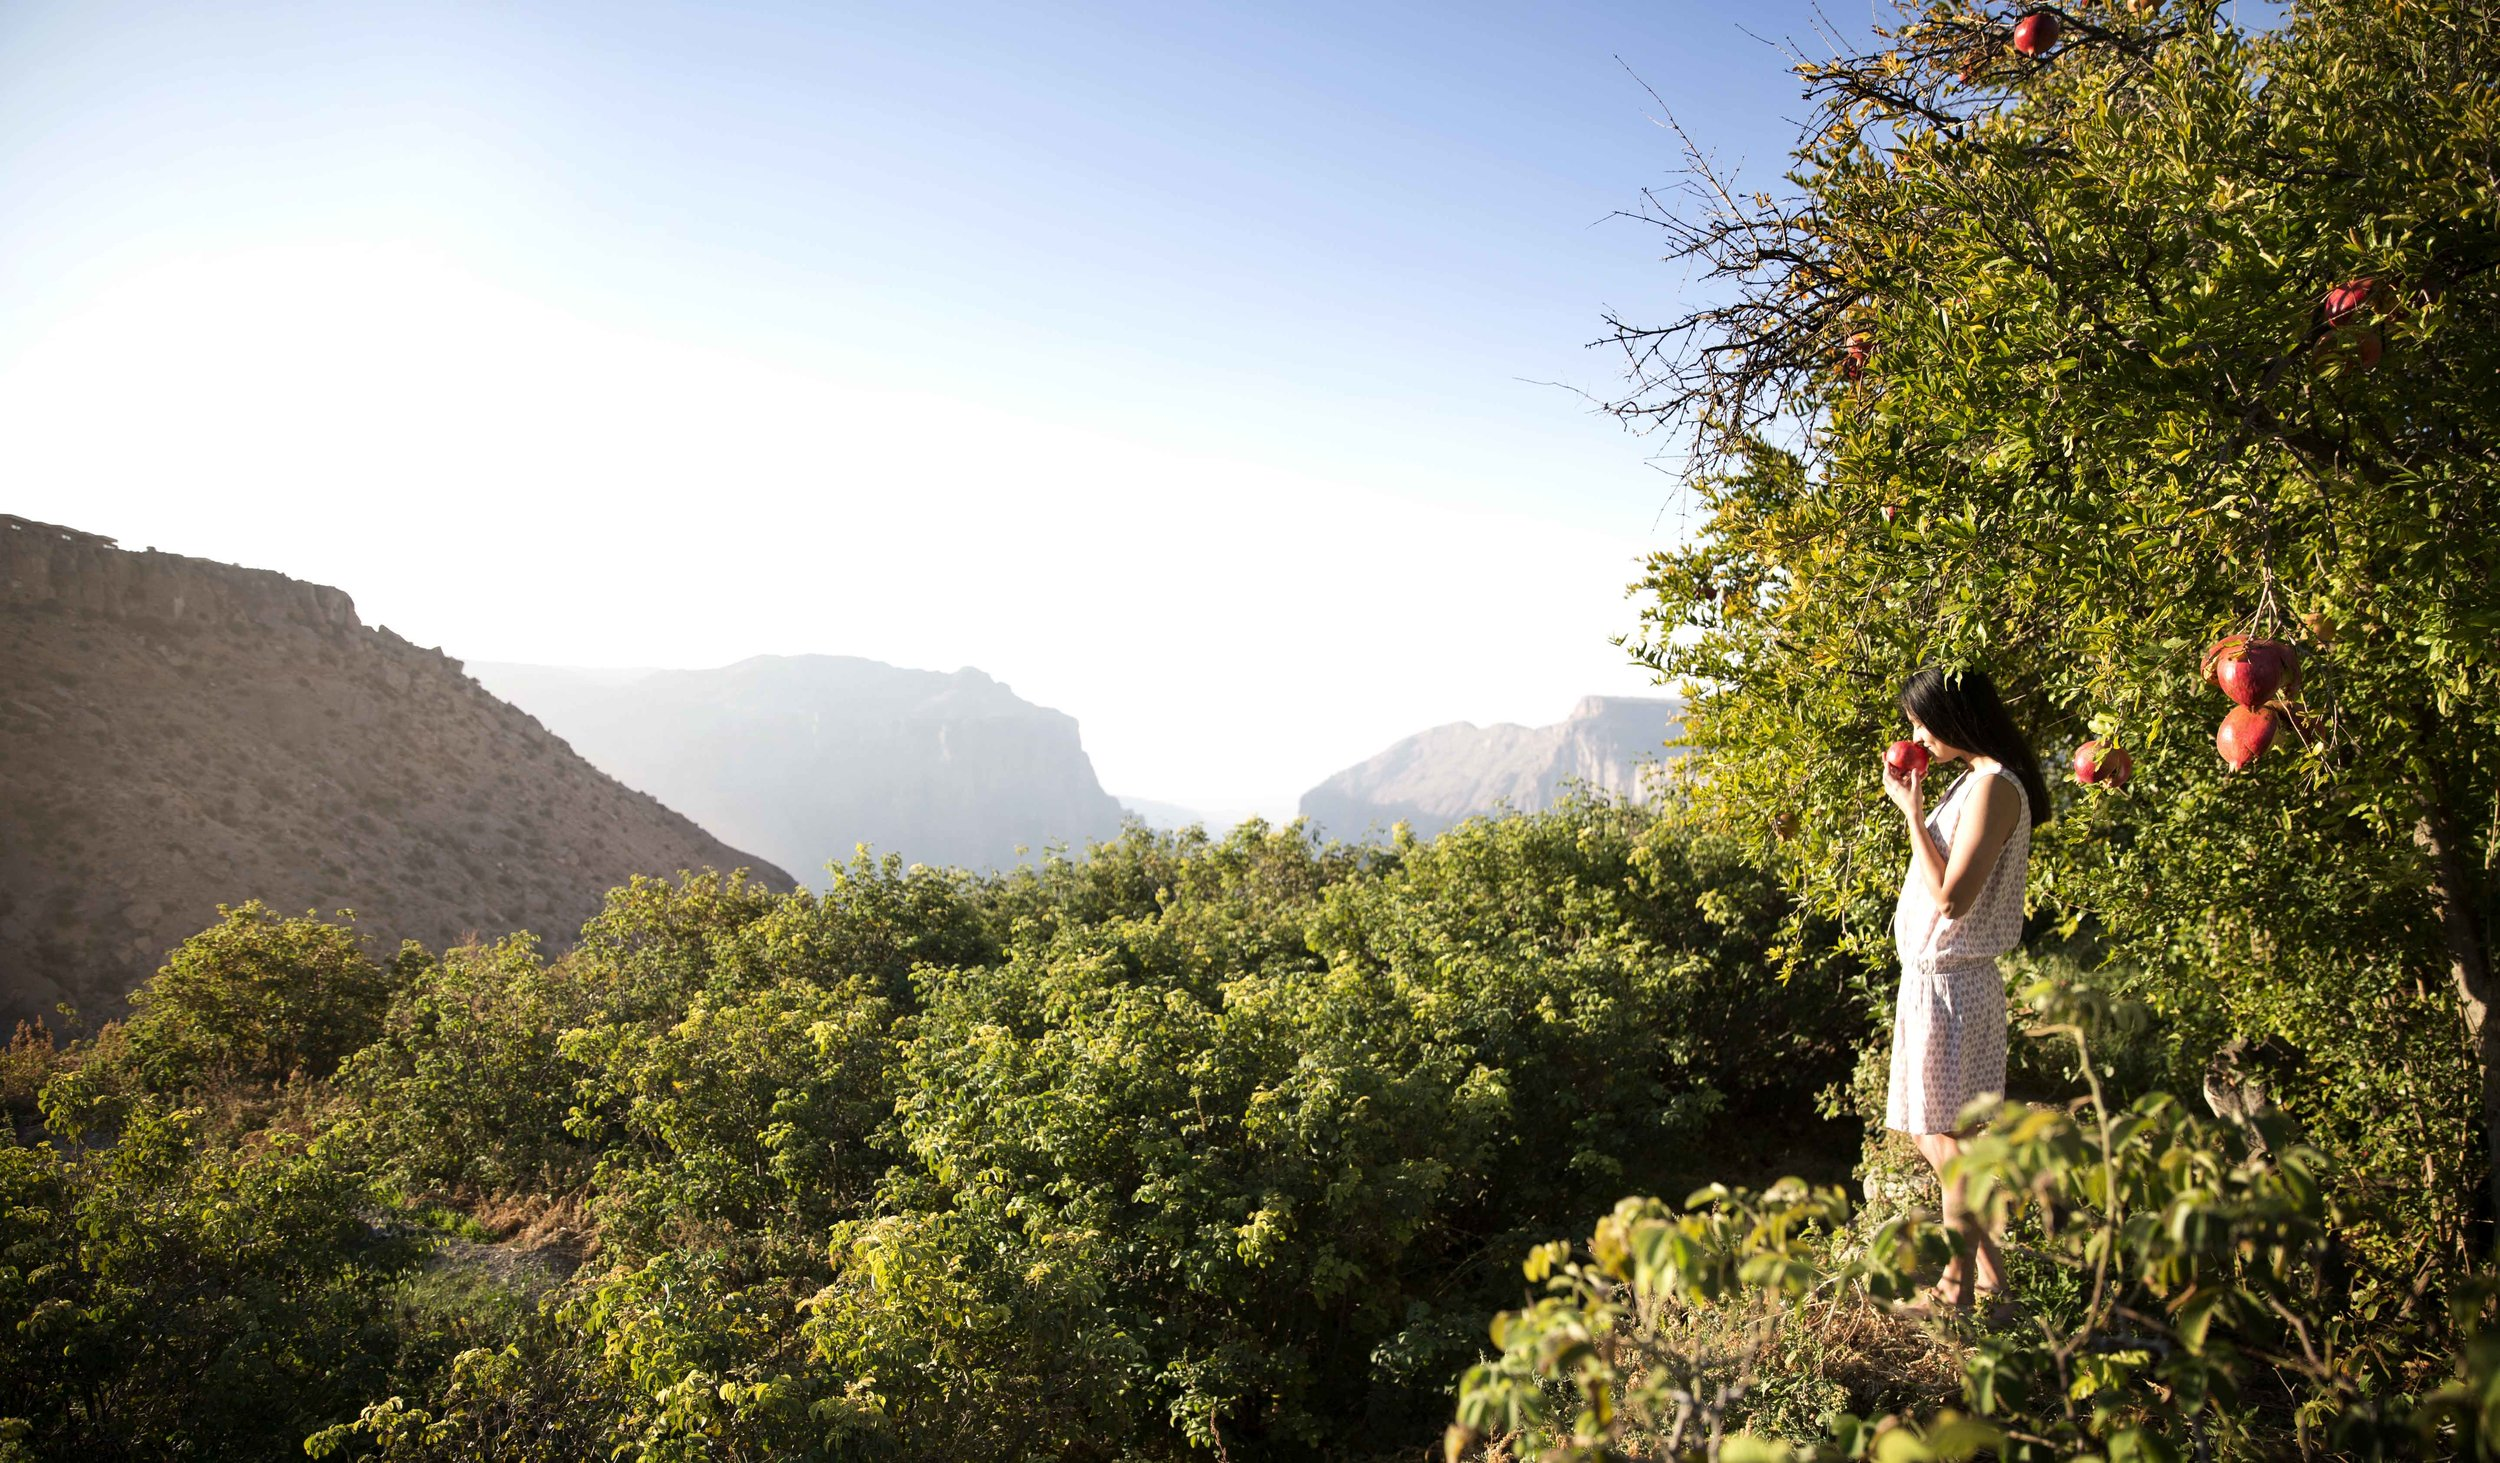 Anantara Al Jabal Al Akhdar Resort - Destination 01.jpg